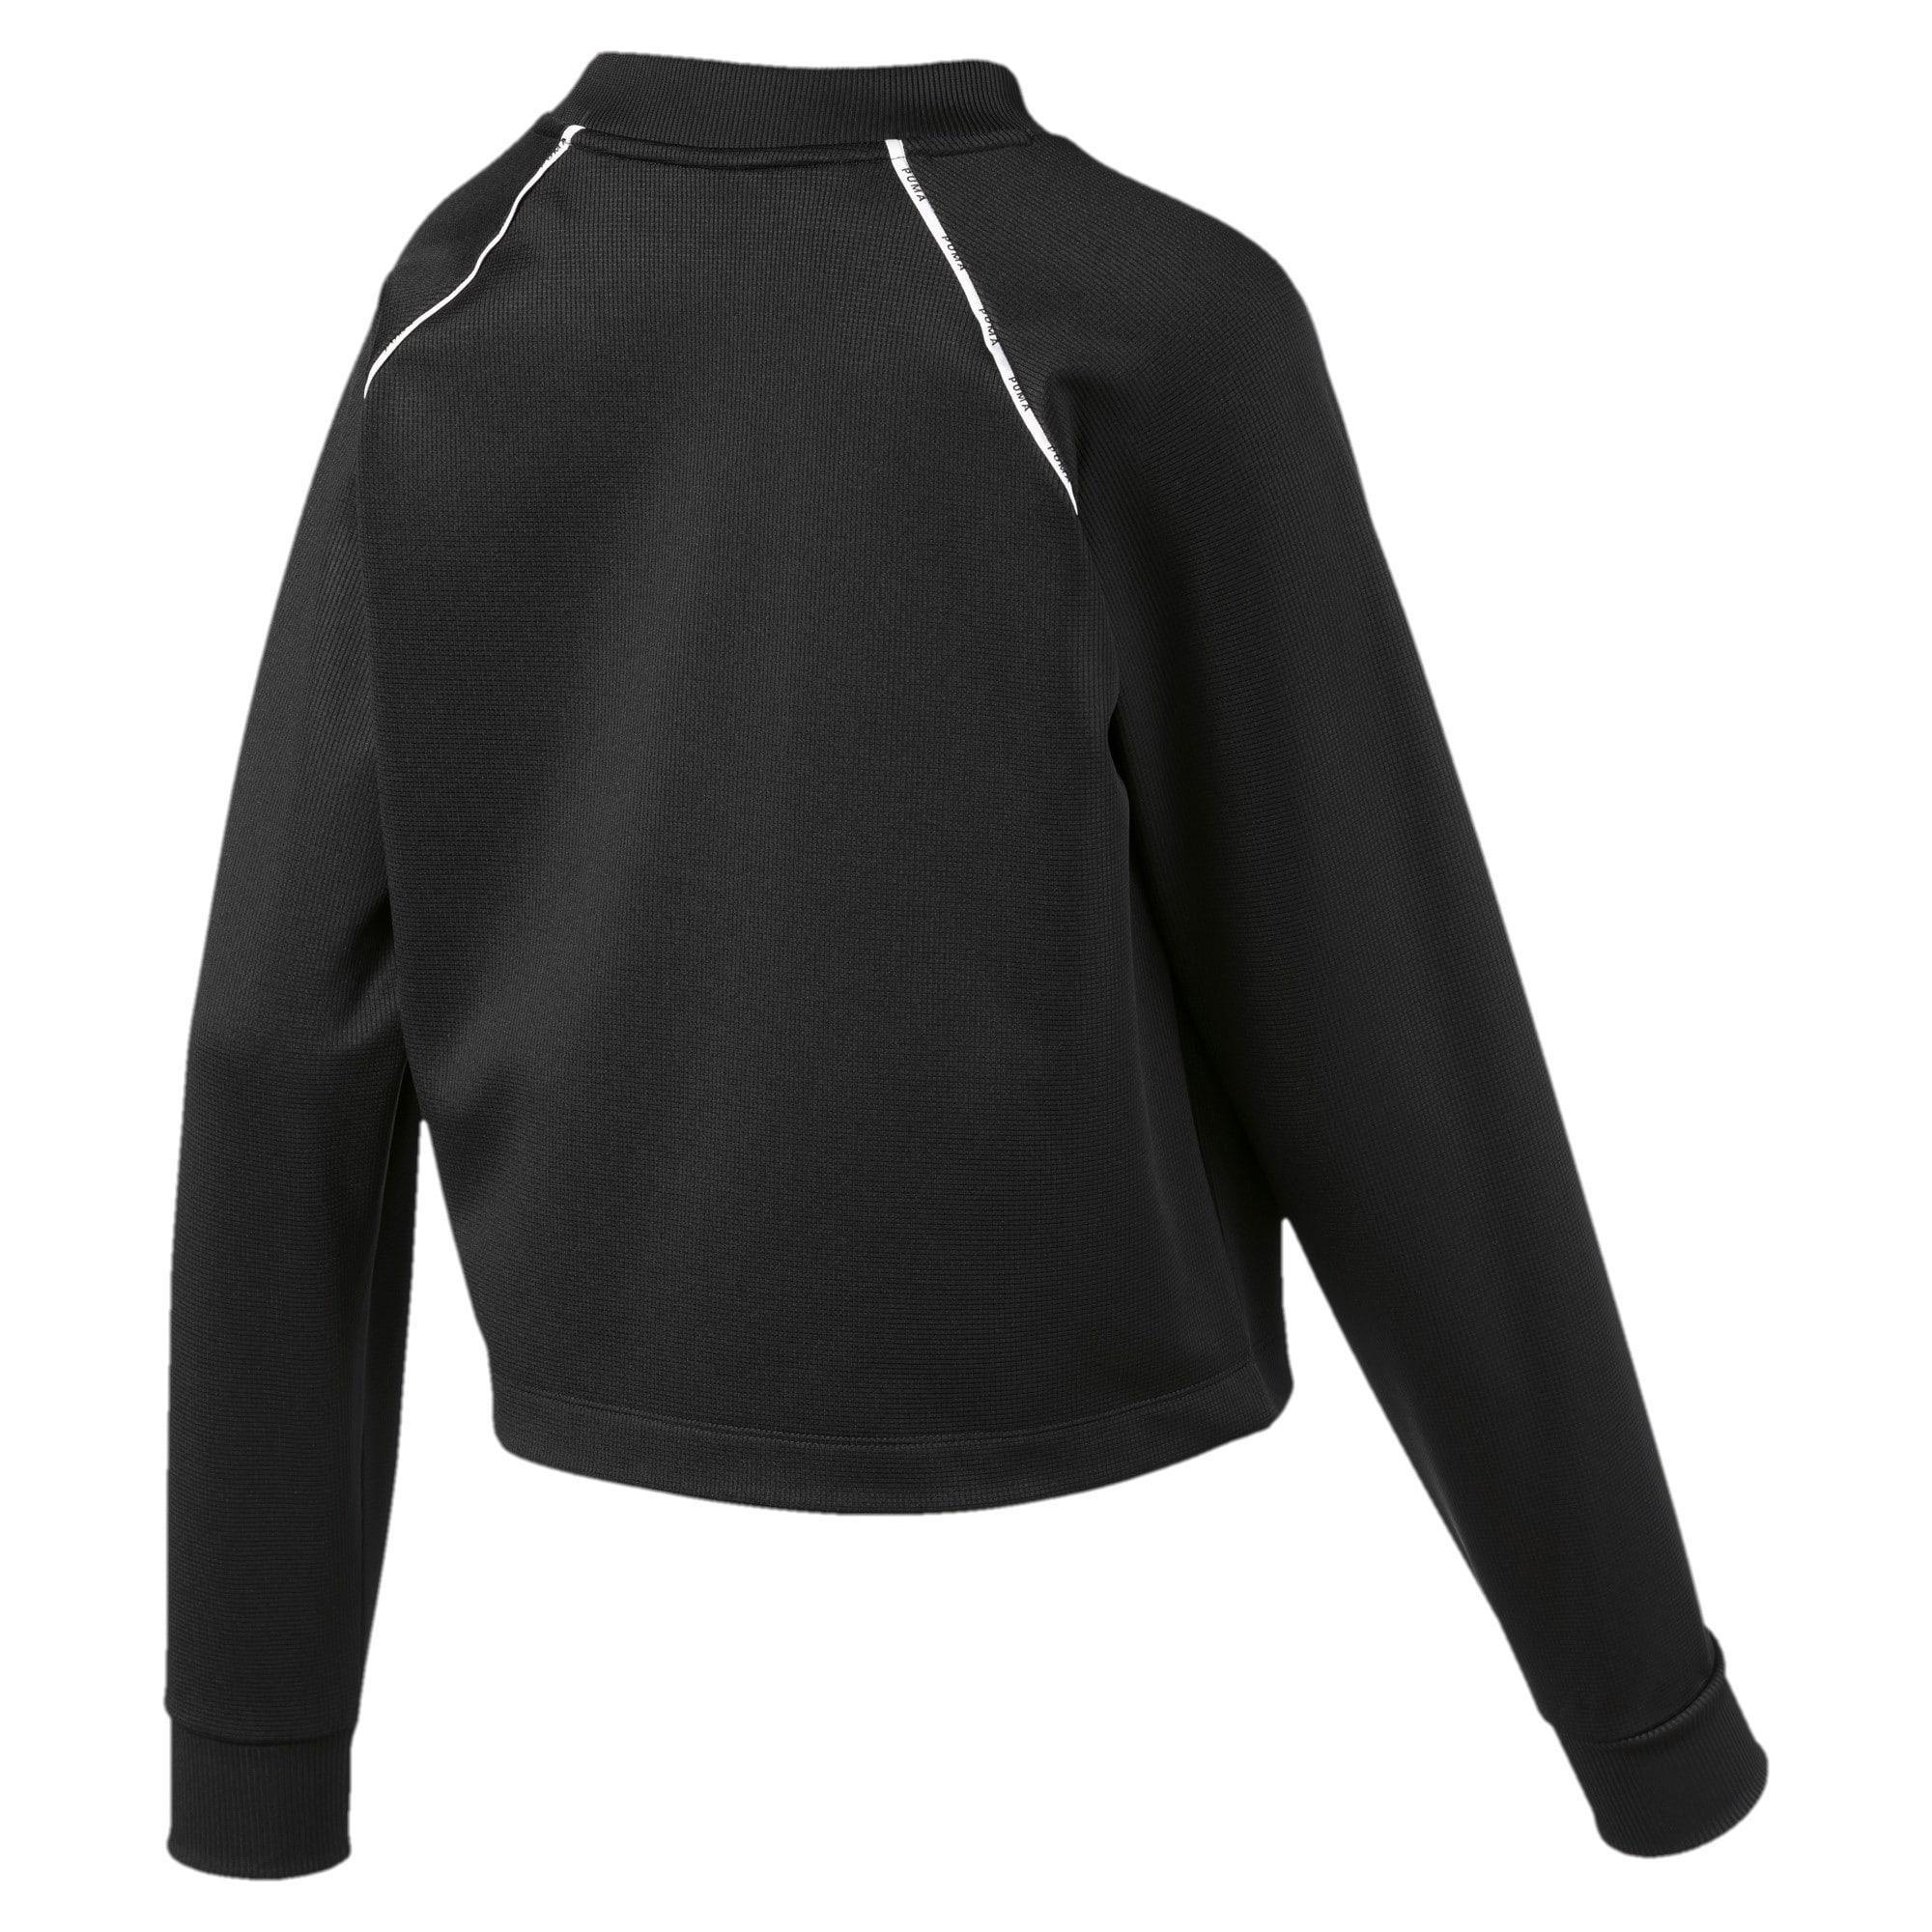 Thumbnail 5 of PUMA XTG Women's Crewneck Sweatshirt, Puma Black, medium